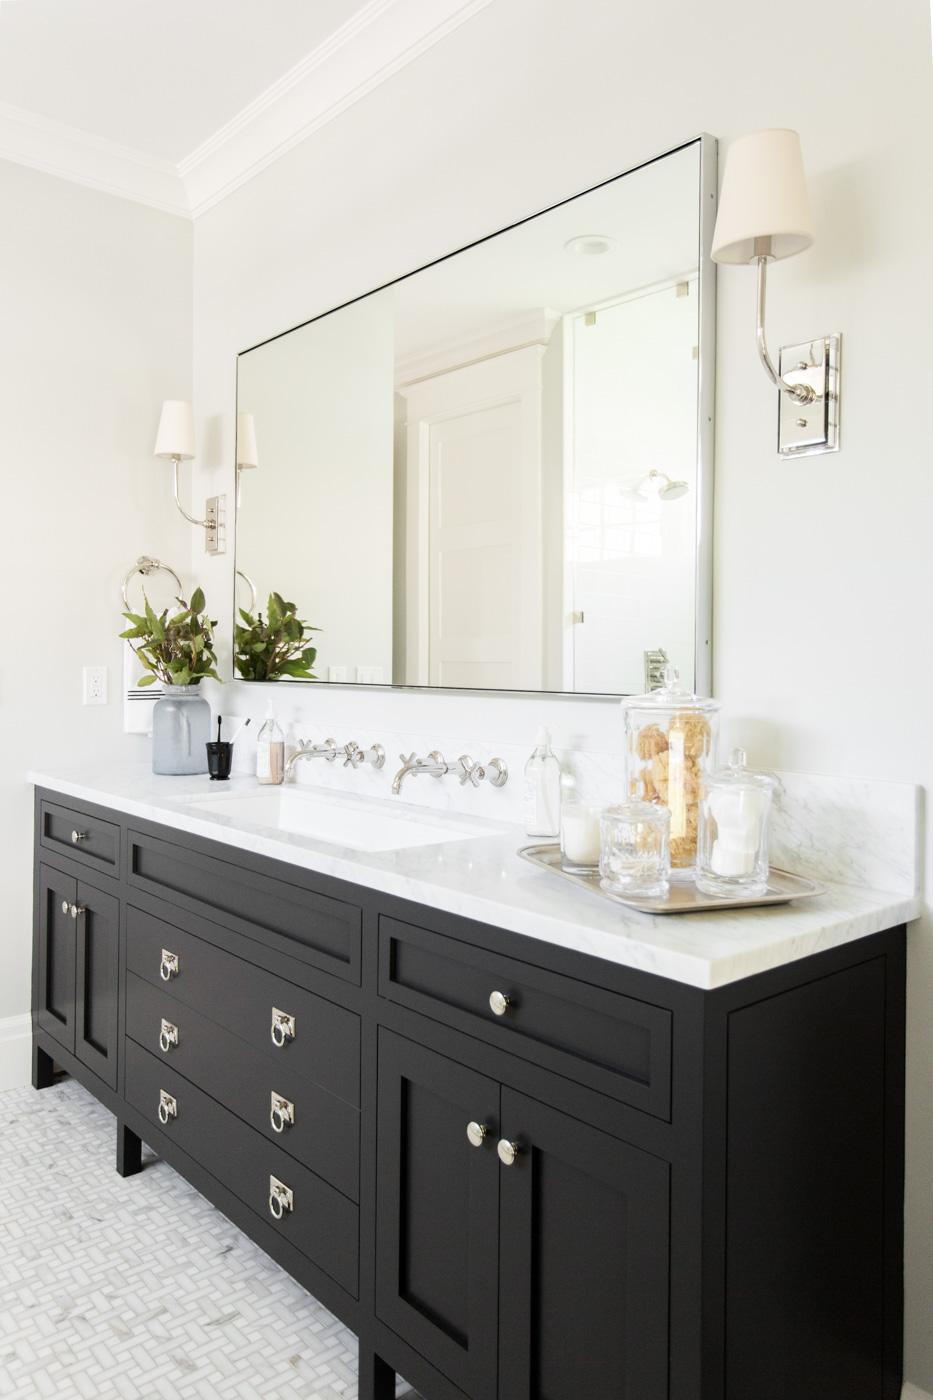 Black+vanity+in+the+Windsong+Project+master+bathroom+||+Studio+McGee.jpg